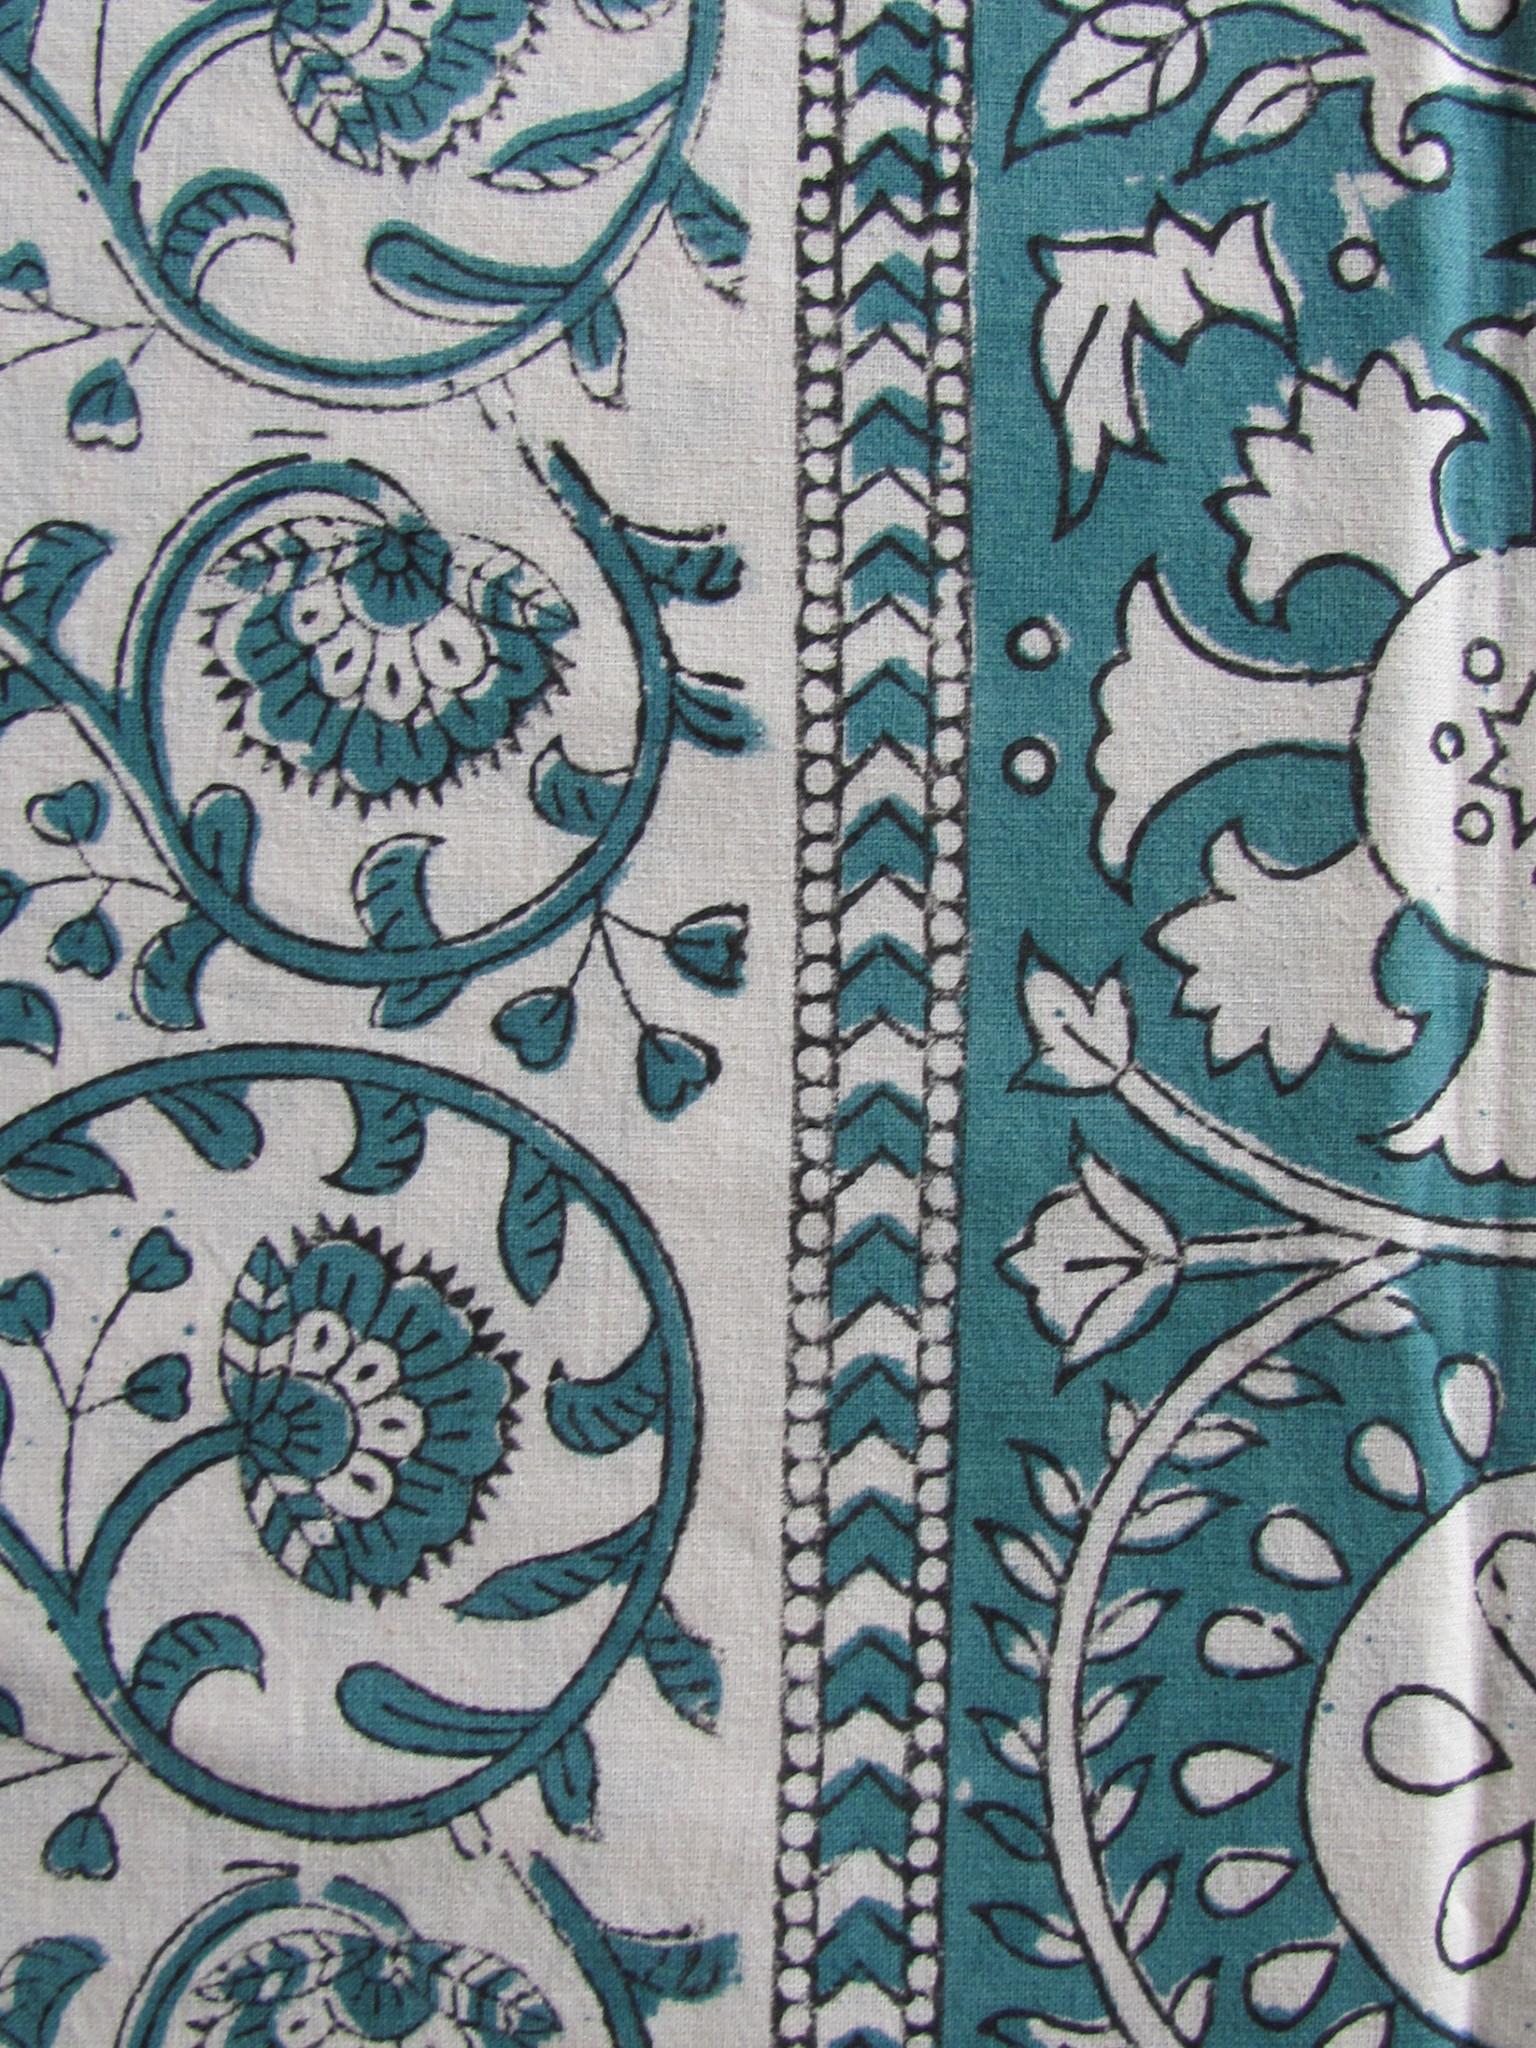 Beddensprei  kleurrijke Indiase slaapkamer,  grand foulard, tafelkleed